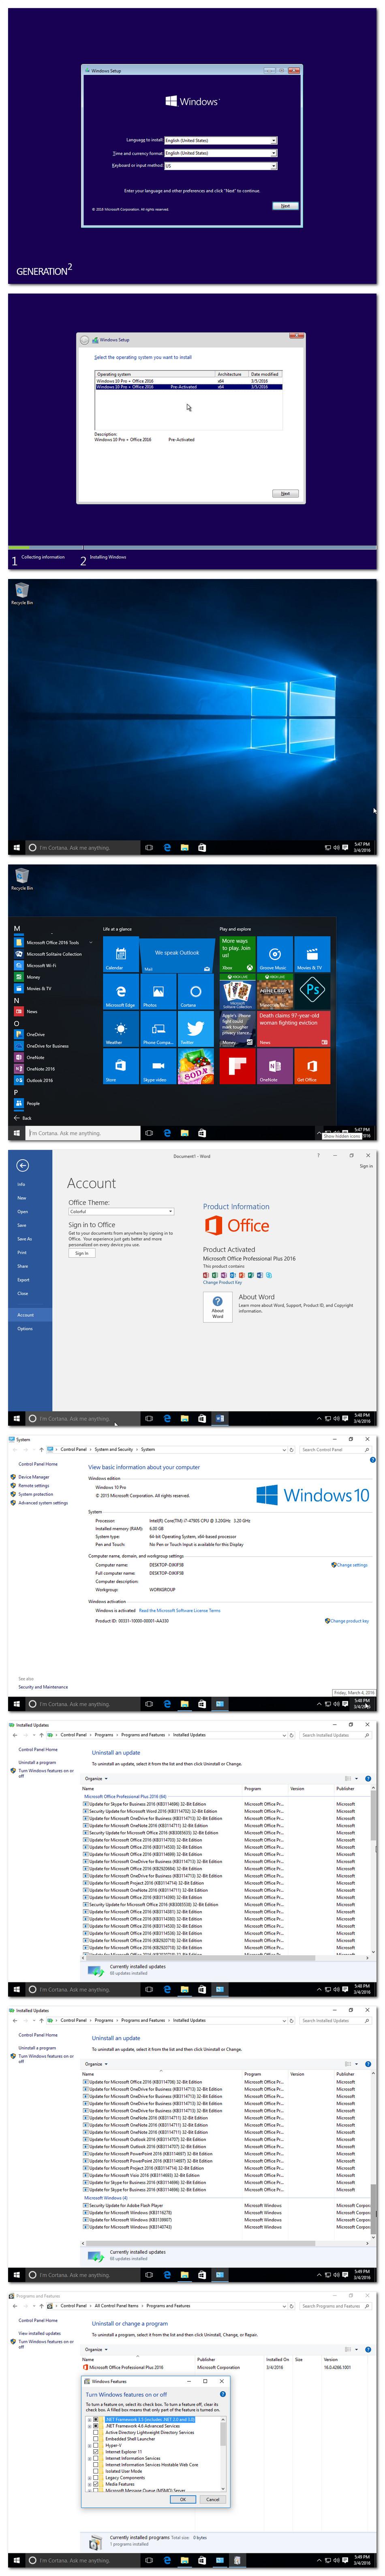 ������ �������� Windows.10.Pro ������� Office